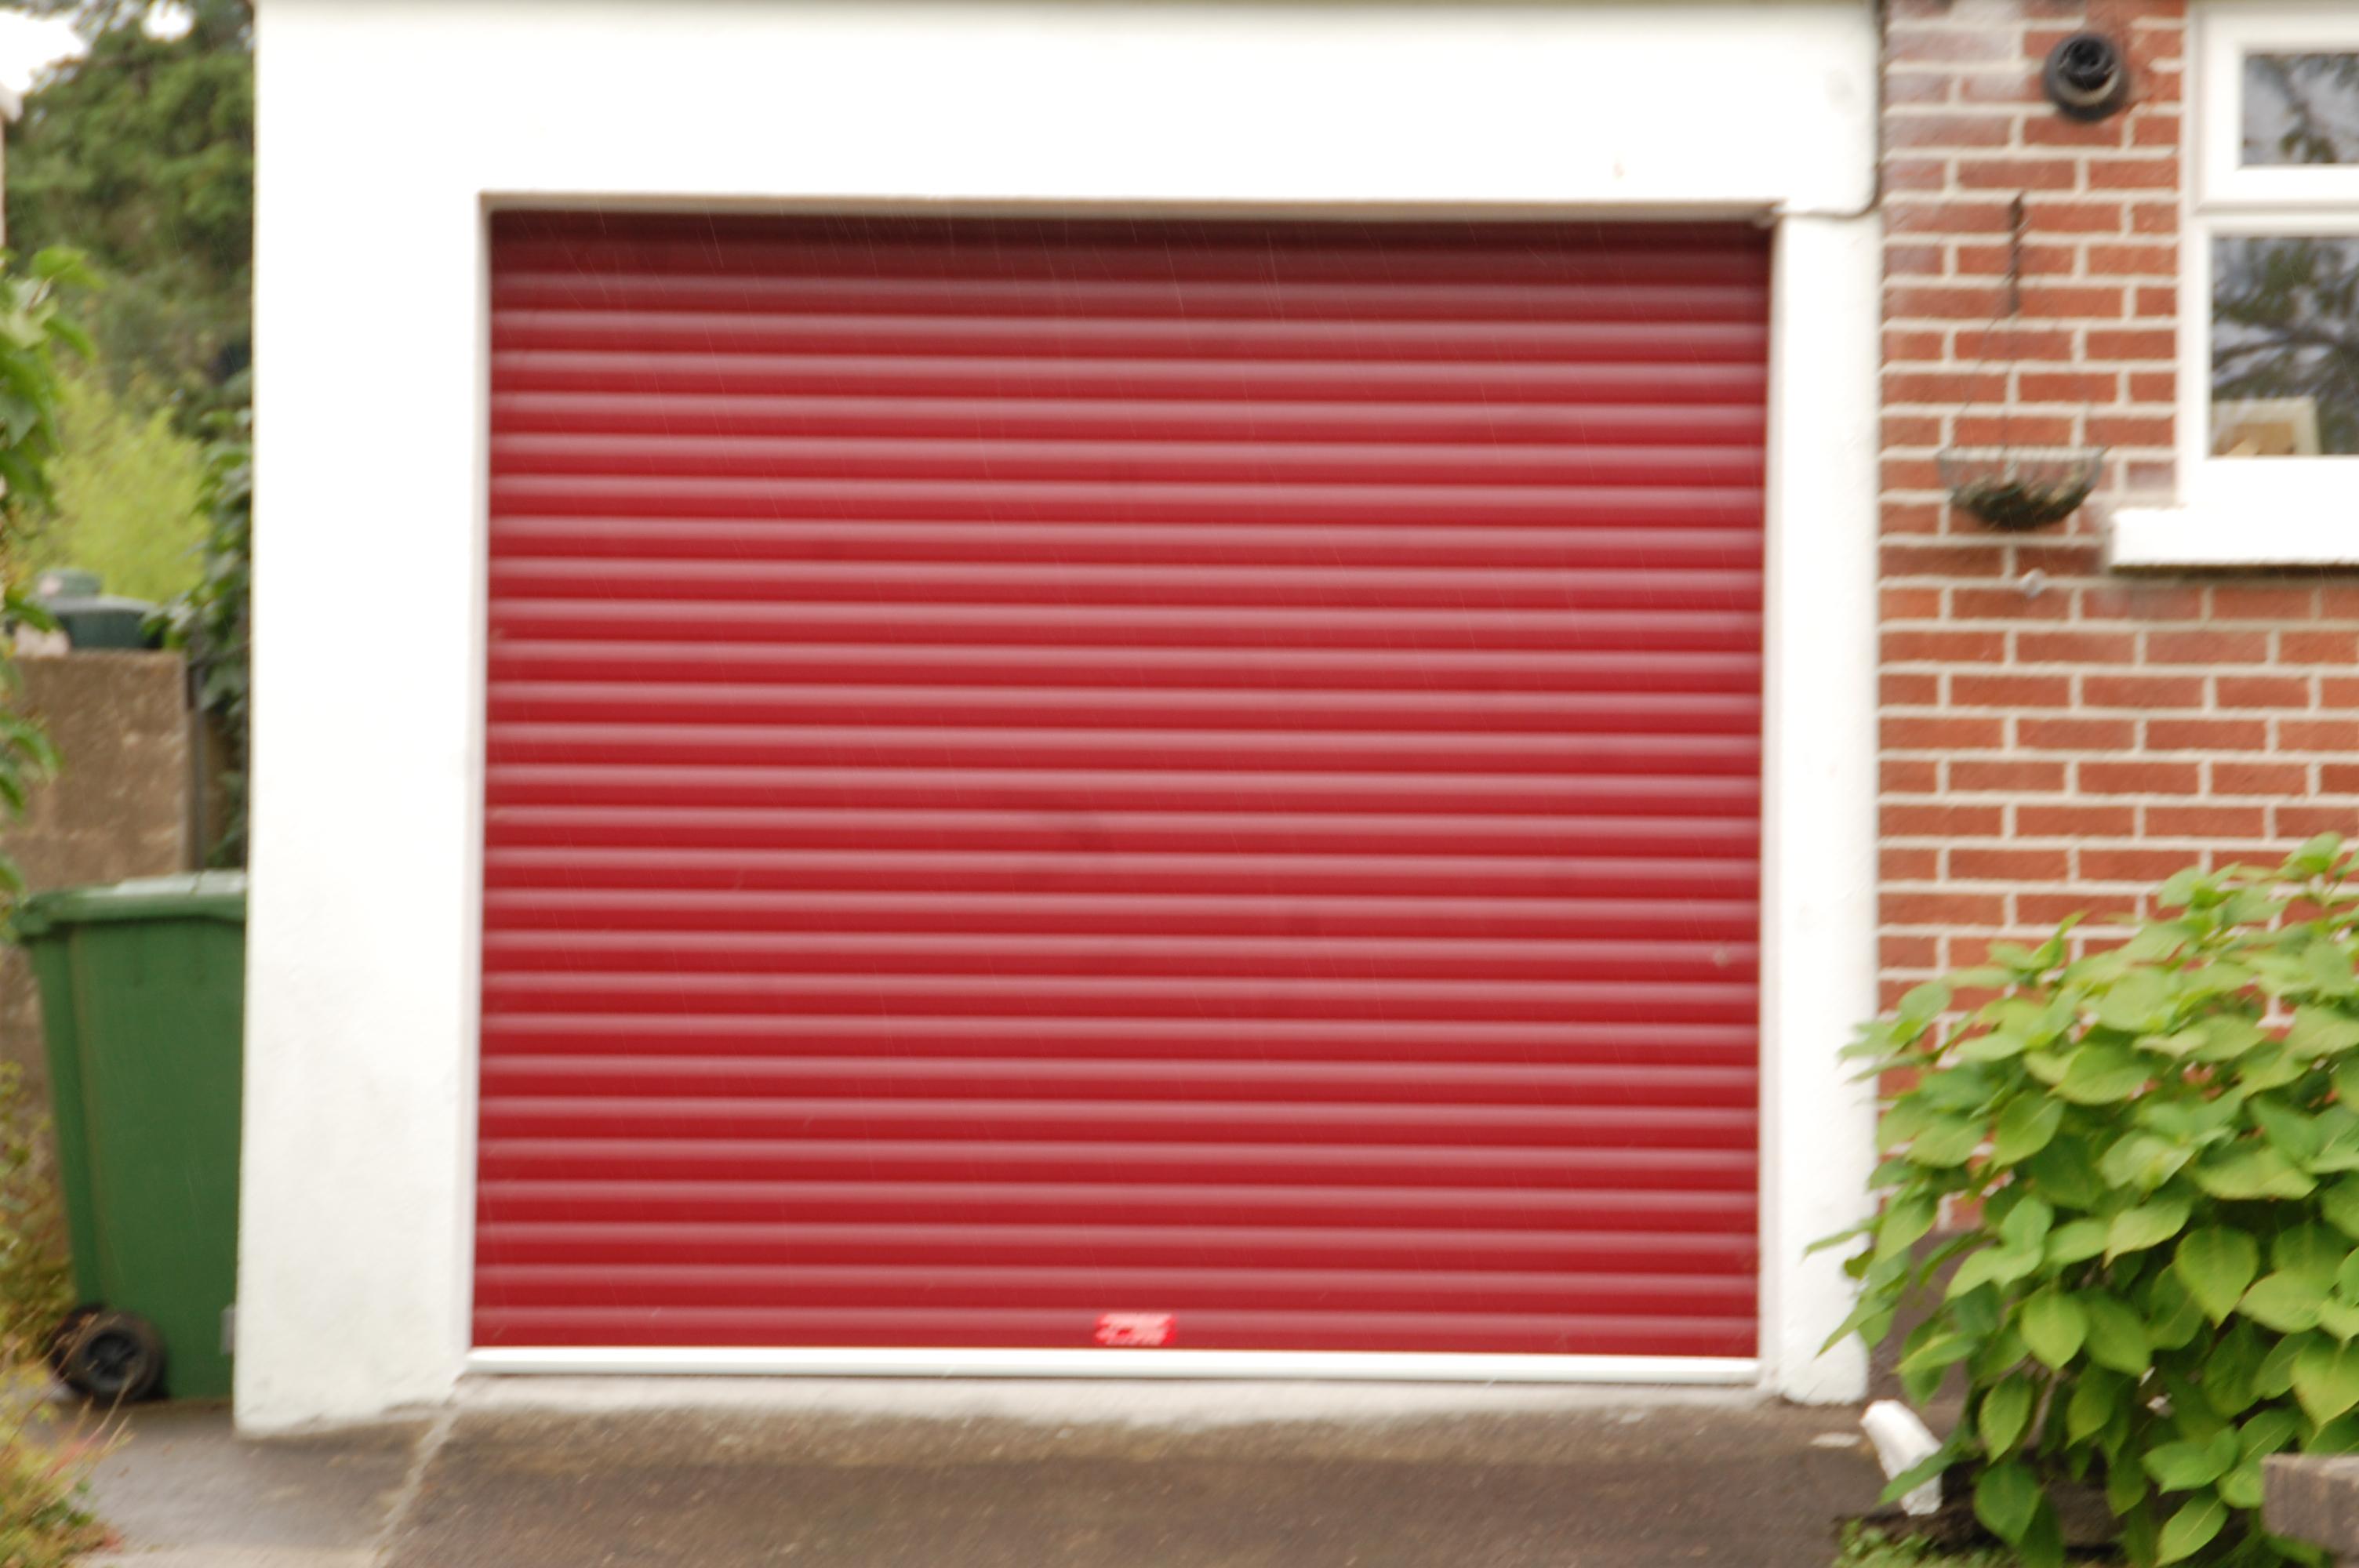 Insulated Garaga Door & Leinster Shutters u0026 Shopfronts Garage Doors - Leinster Shutters ...